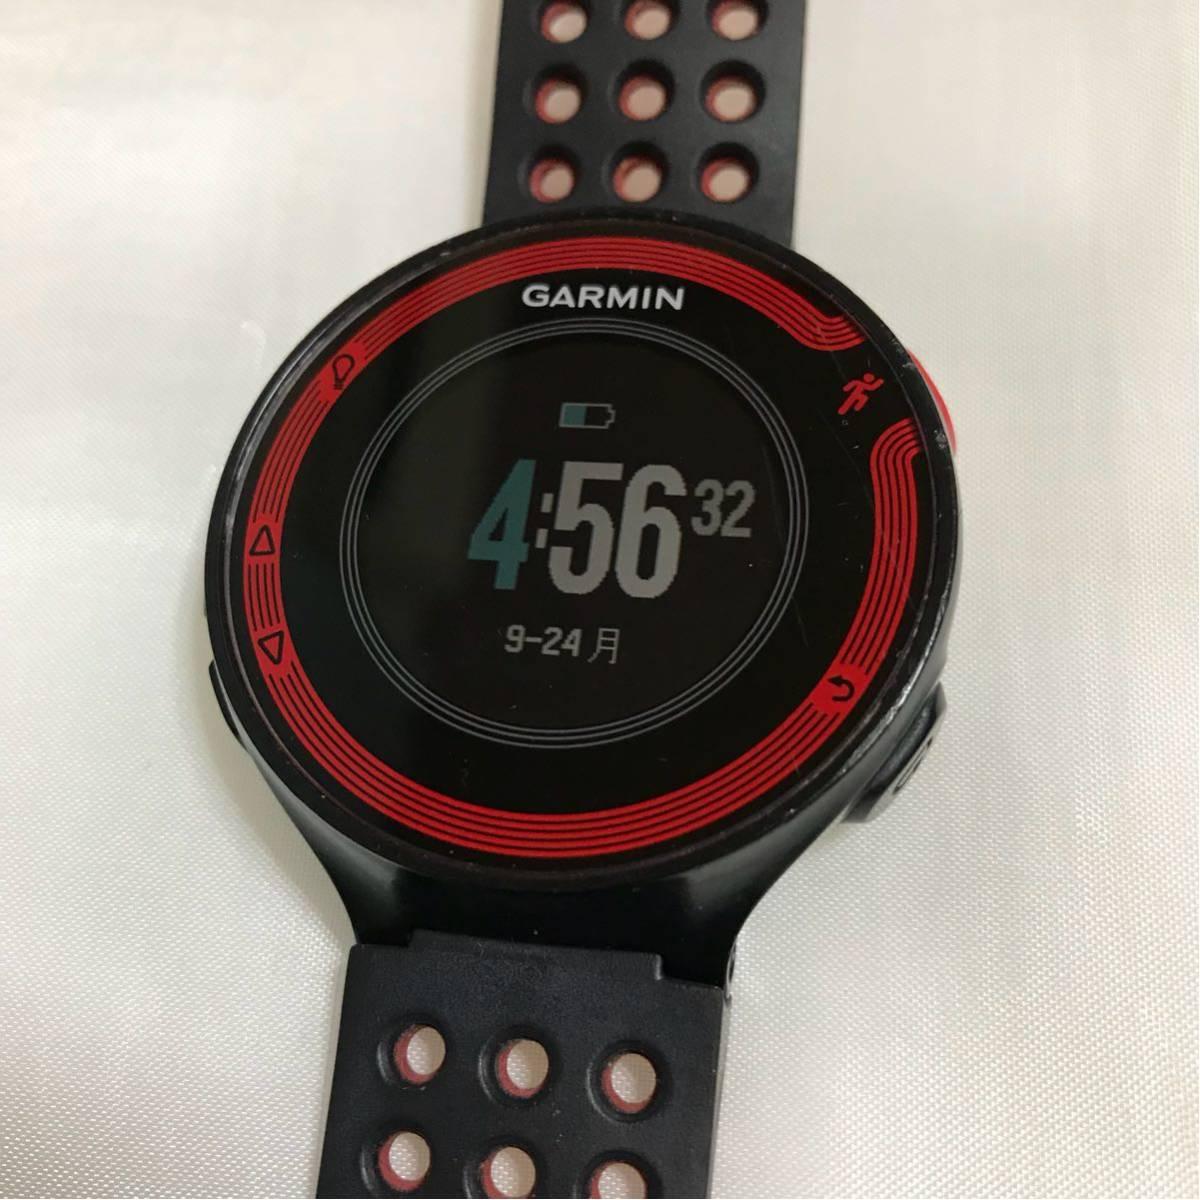 3401774831 ... GARMIN ForeAthlete 220J 黒赤 国内版 GPS ランニングウォッチ 防水 Bluetooth みちびき対応 Gセンサー  ...